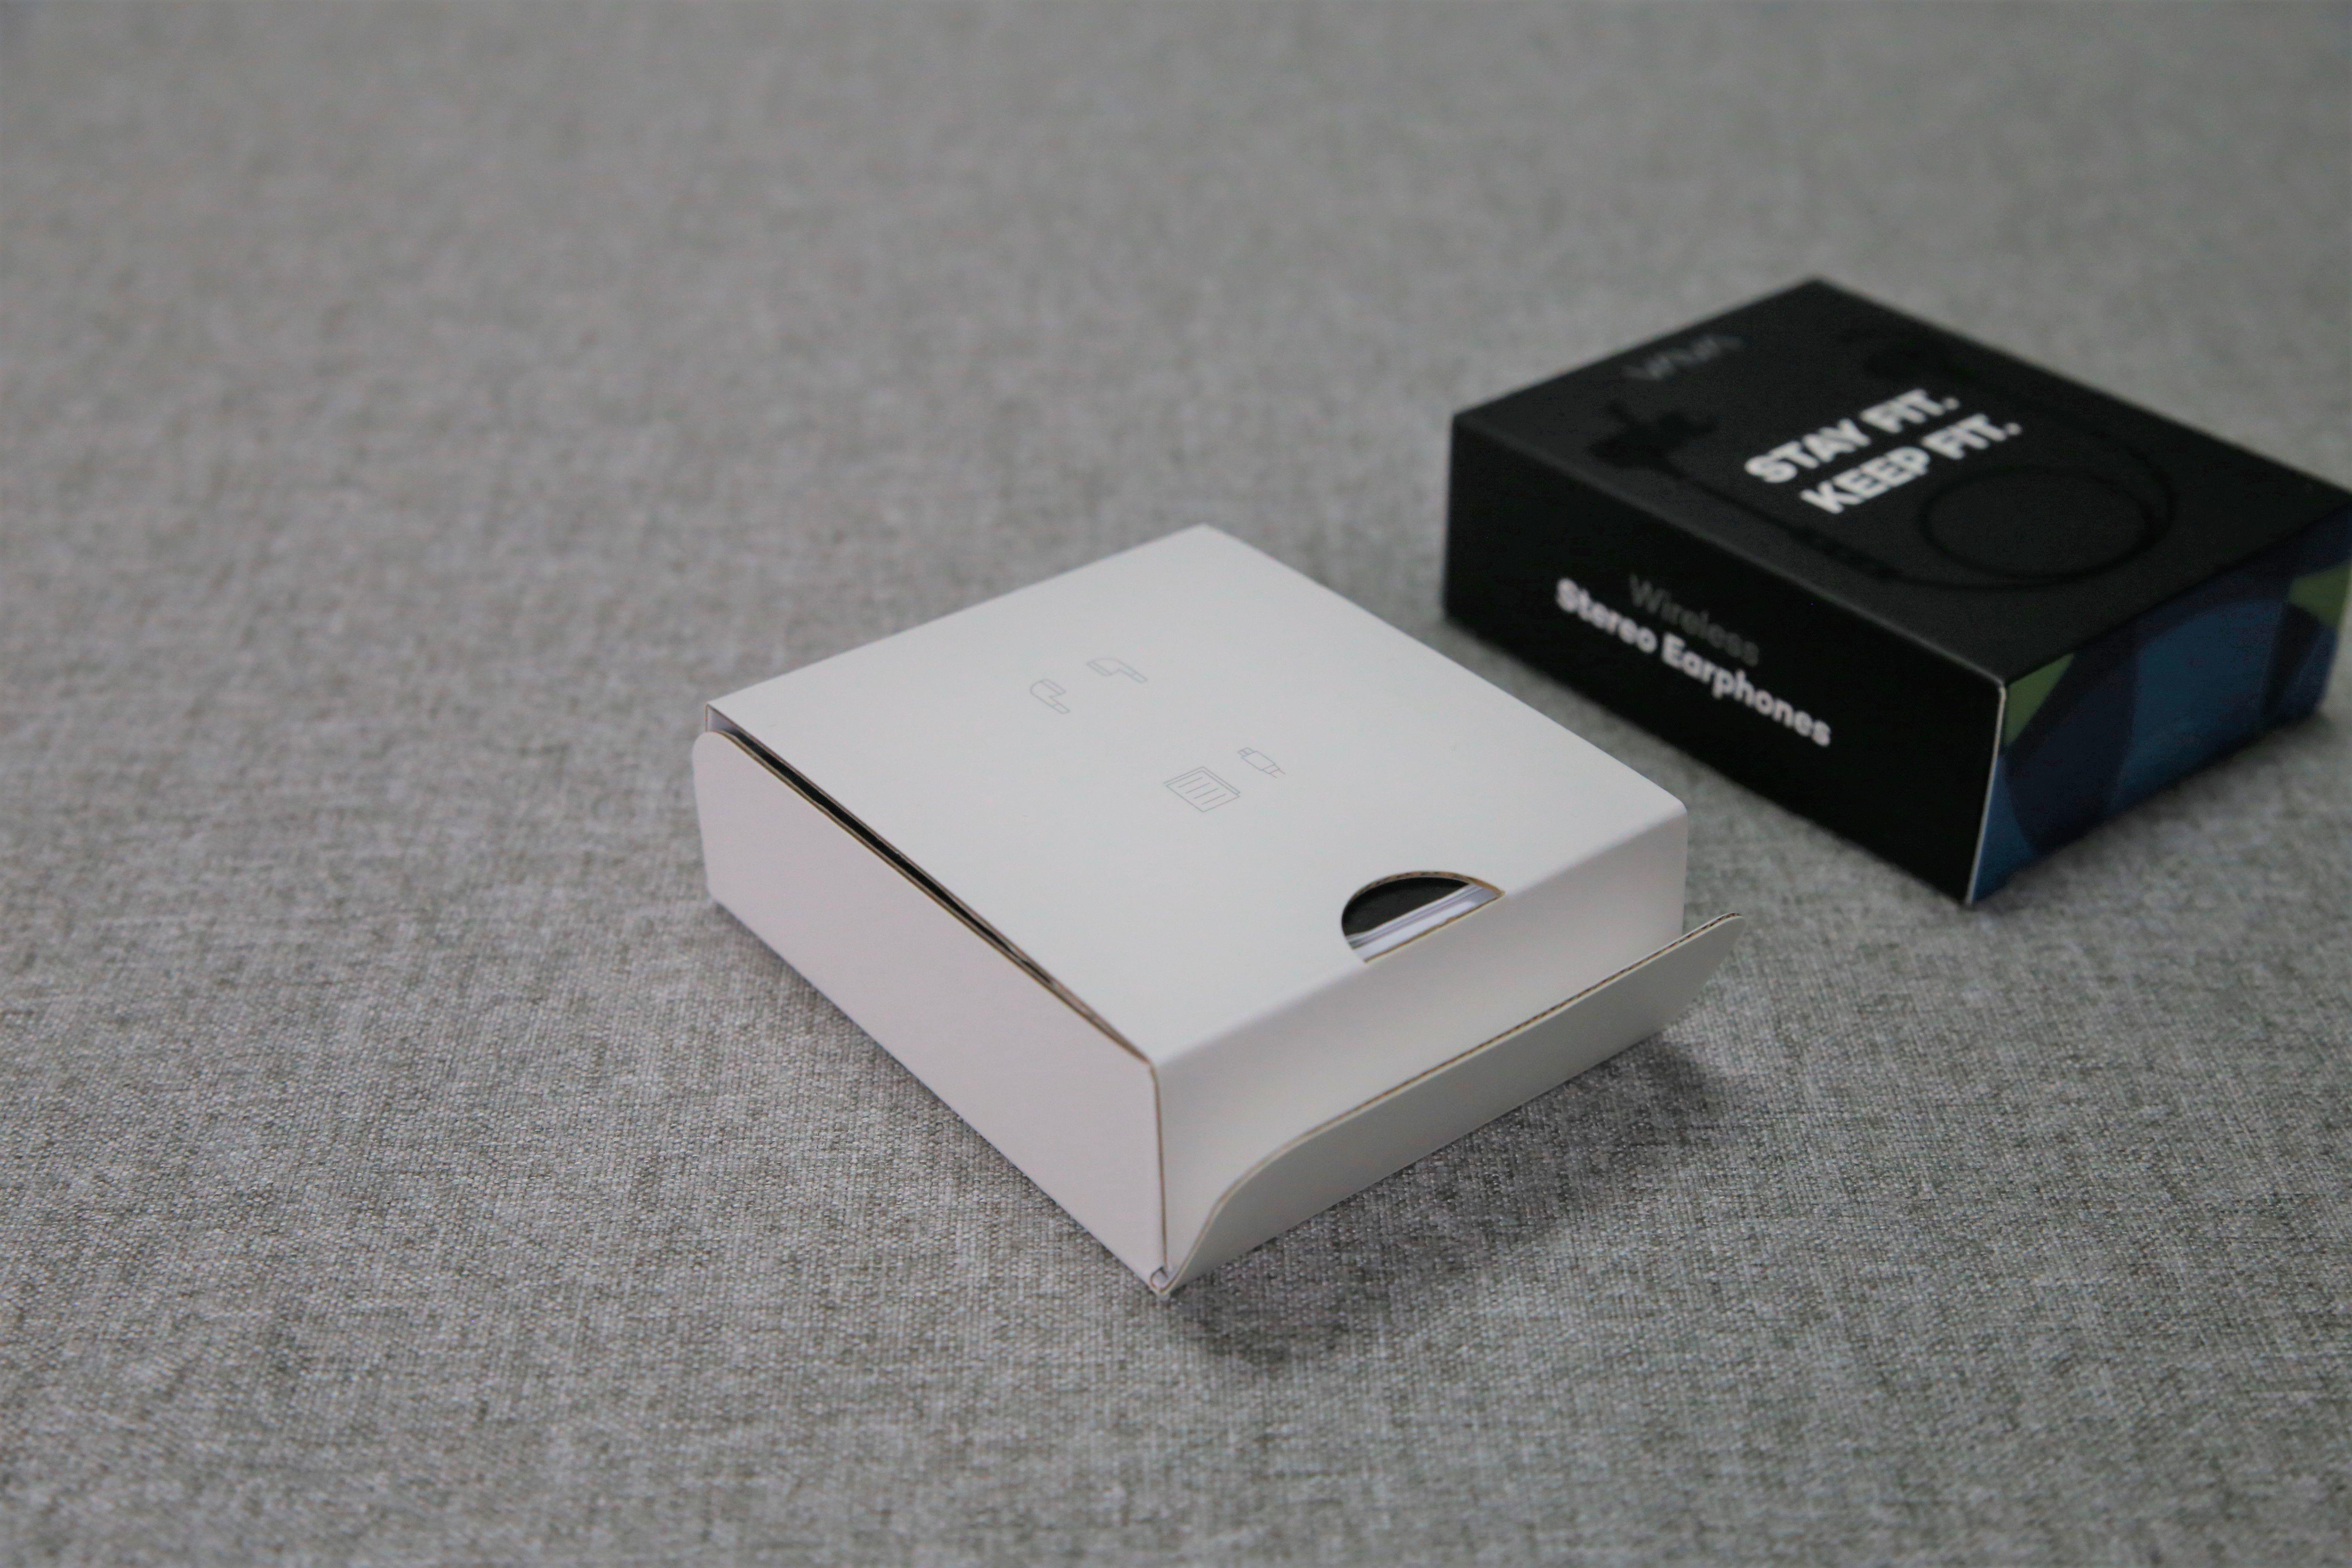 VAVA MOOV 28 磁吸藍牙耳機推薦 - 內盒